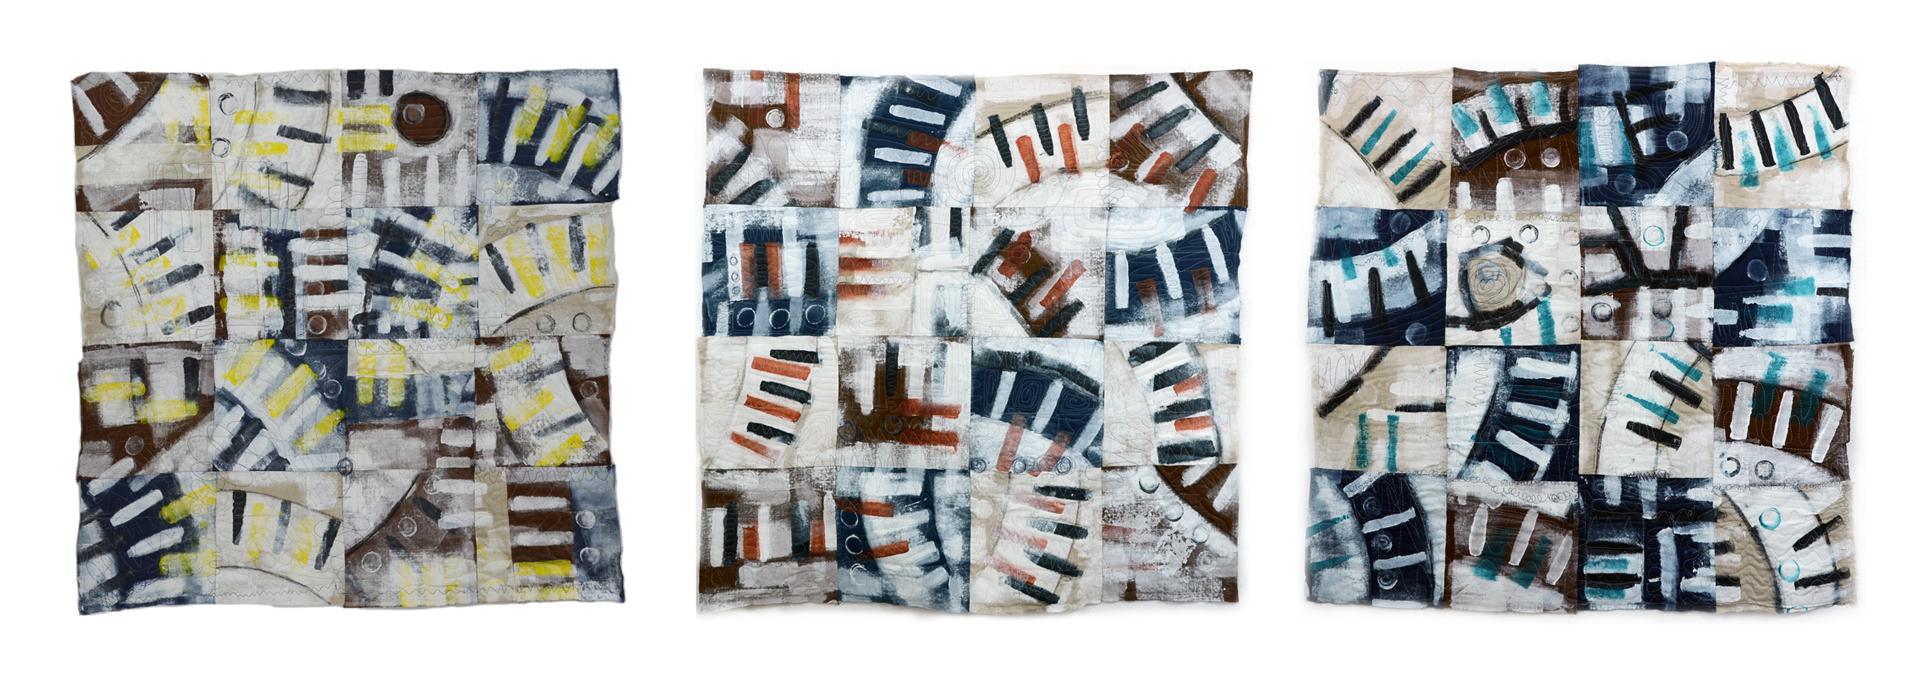 "Willis, Joshua, ""Broken Circles (Triptych),"" Linen, Acrylic, 40"" x 12"", 2016"